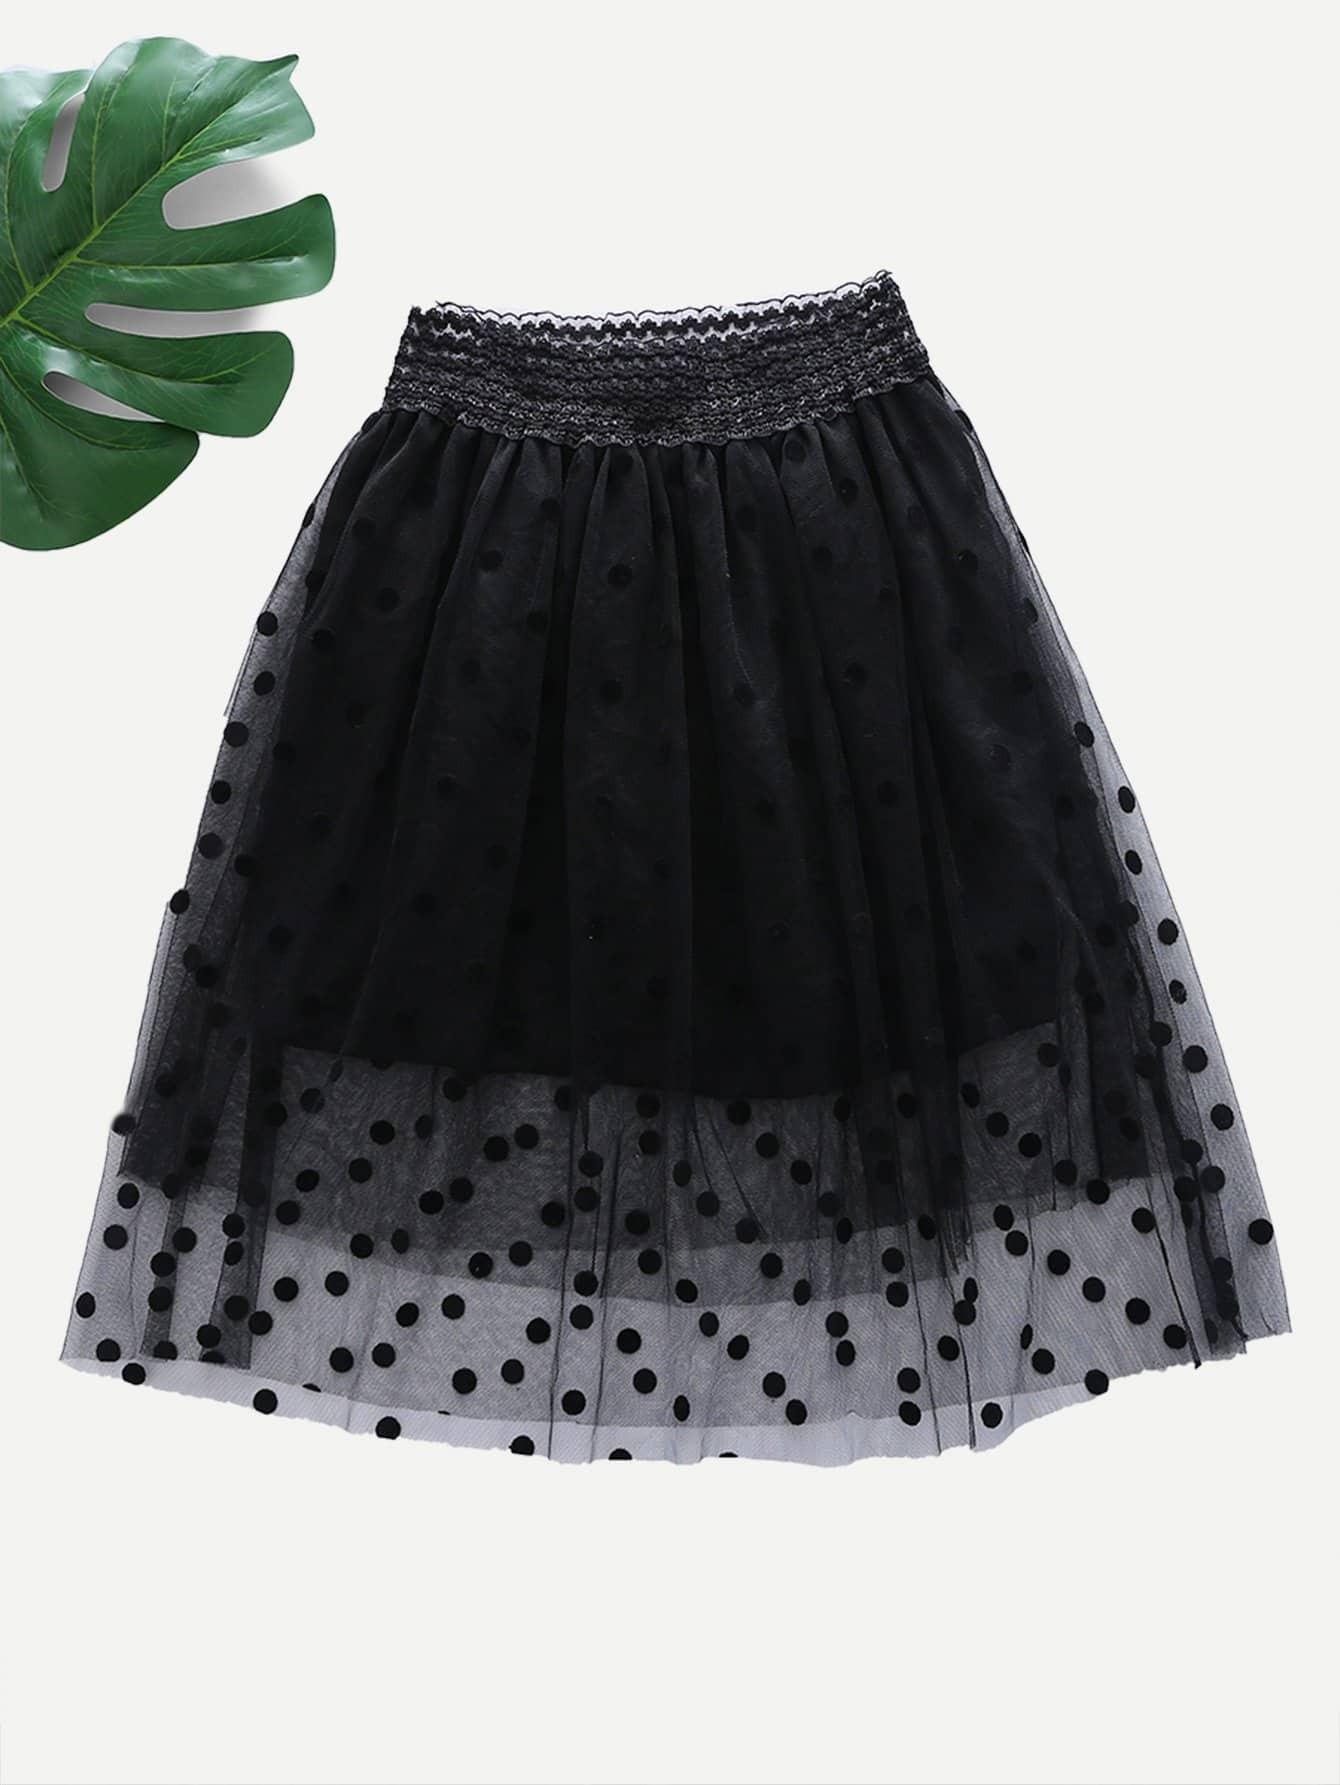 Girls Polka Dot Layered Skirt layered organza skirt